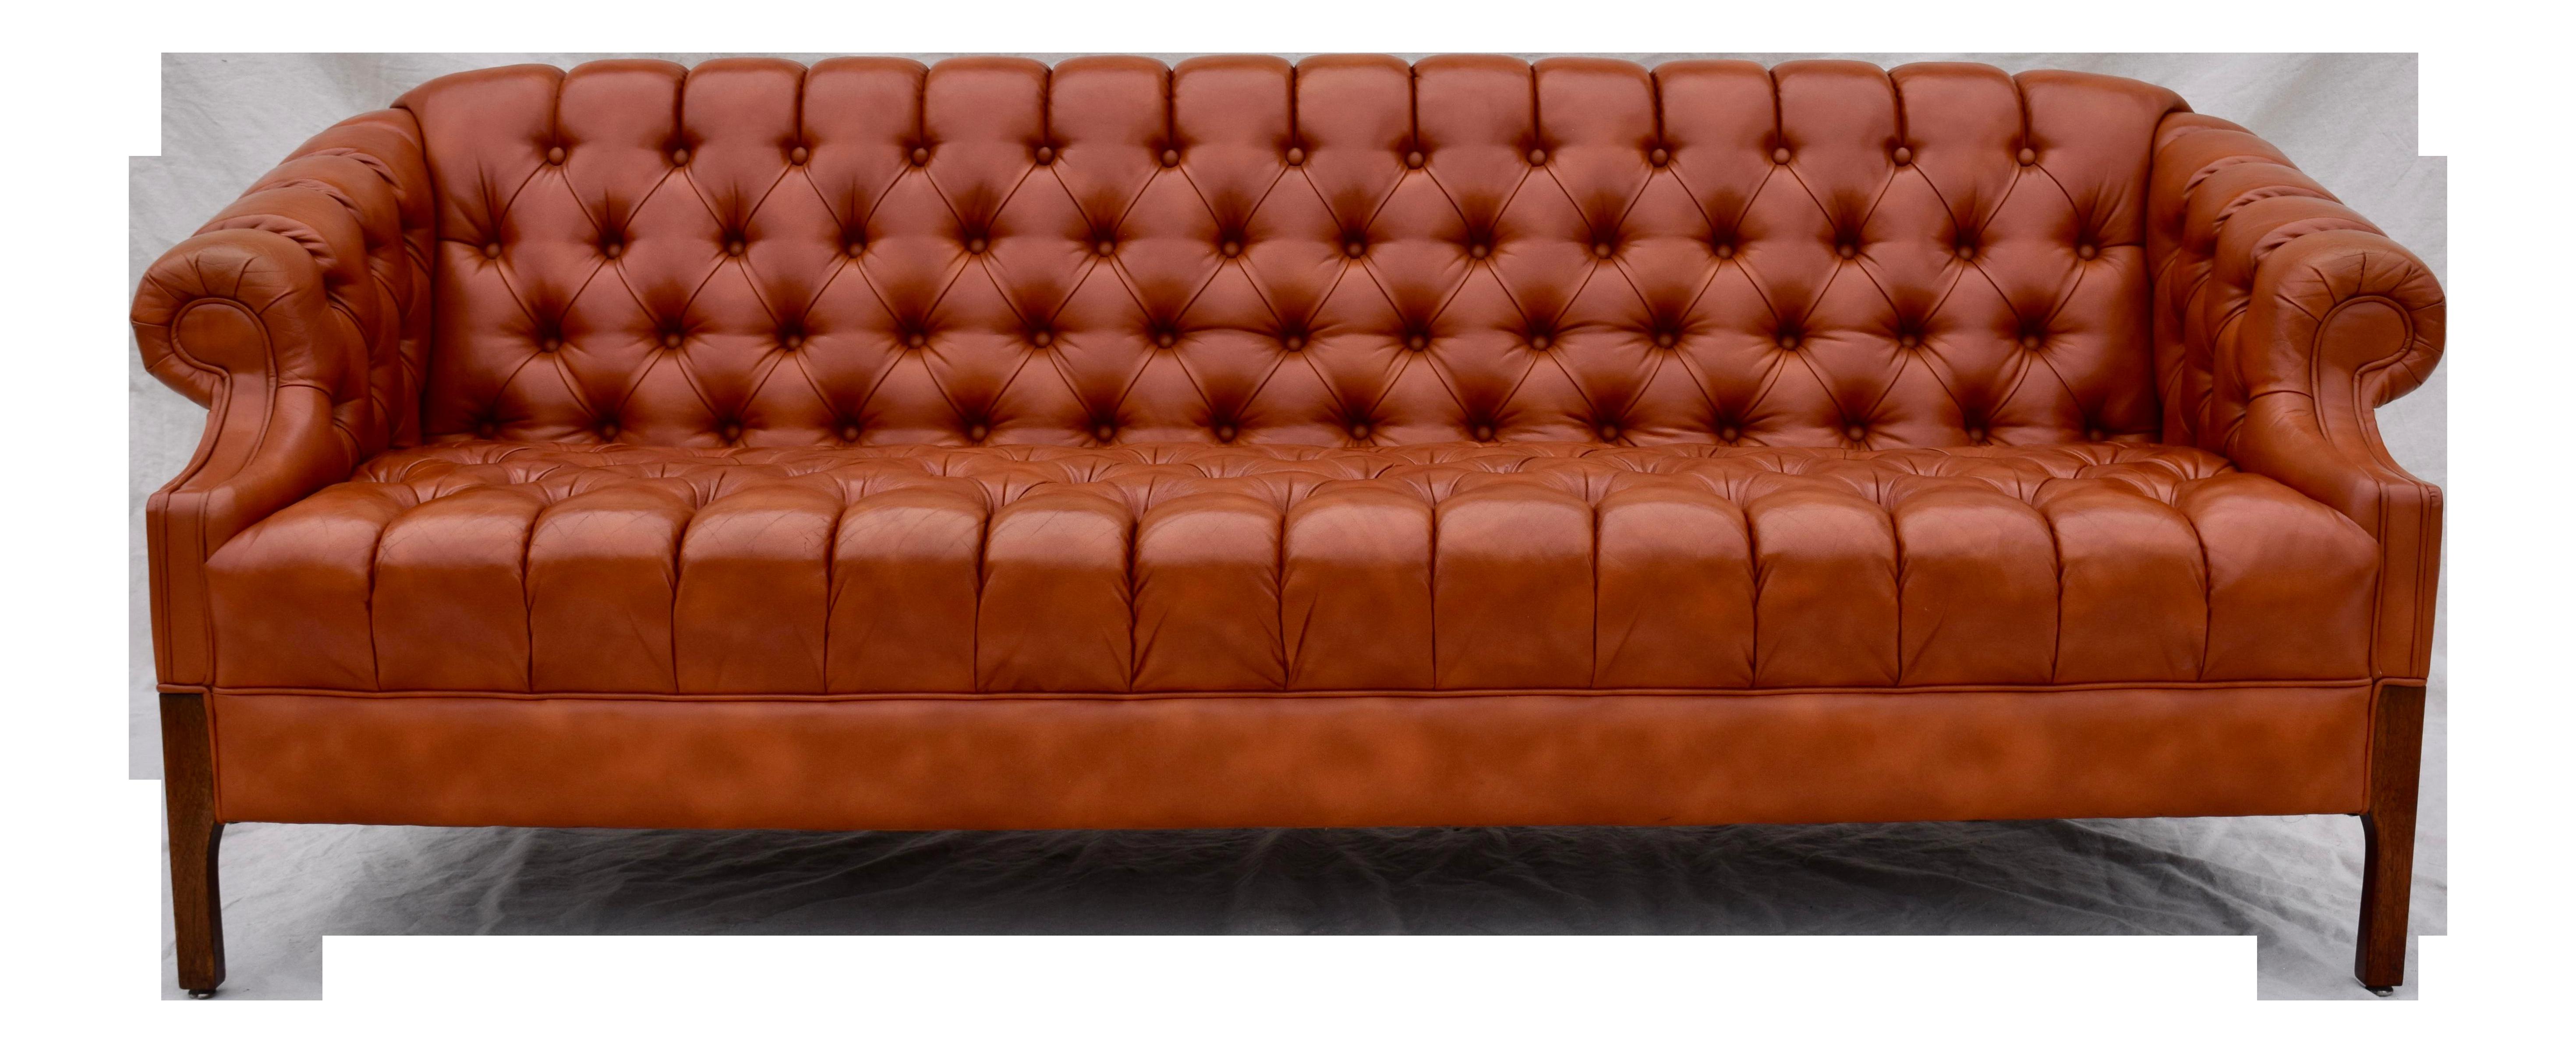 Swedish Leather Chesterfield Sofa